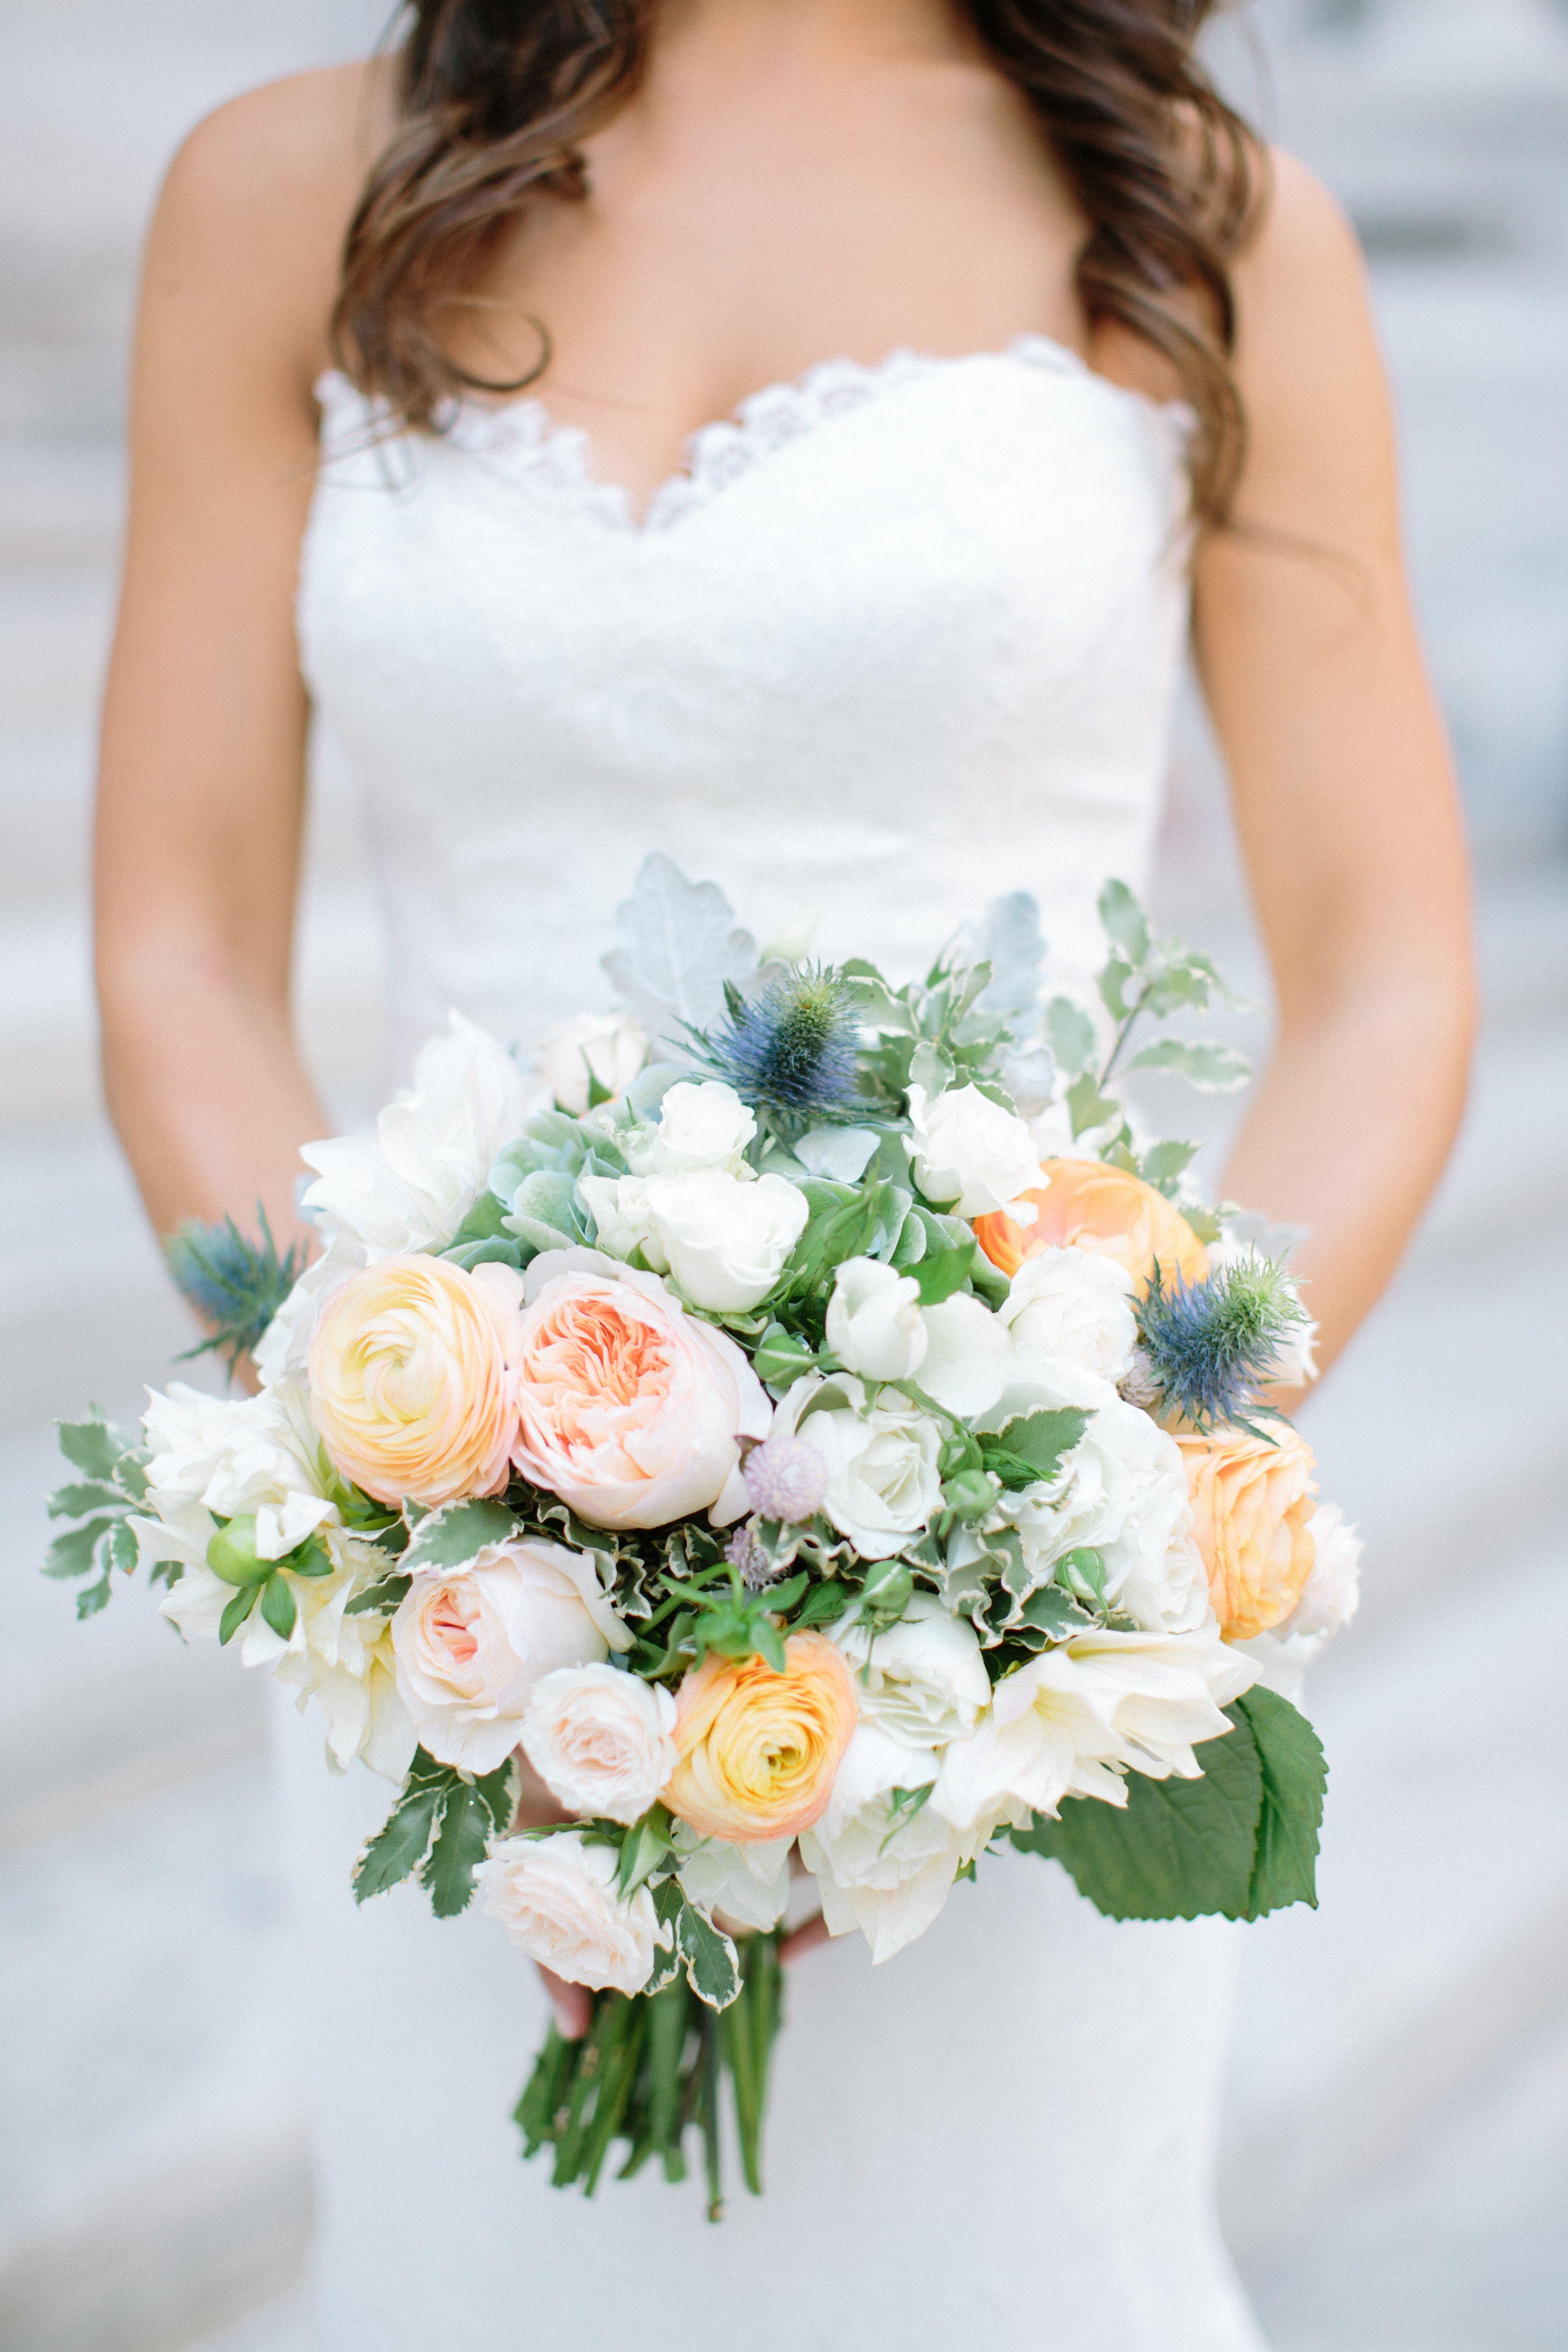 #thistle, #garden-rose, #ranunculus  Photography: Caroline Frost Photography - carolinefrostphotography.com  Read More: http://www.stylemepretty.com/2014/10/27/nyc-summer-garden-wedding-in-bryant-park/